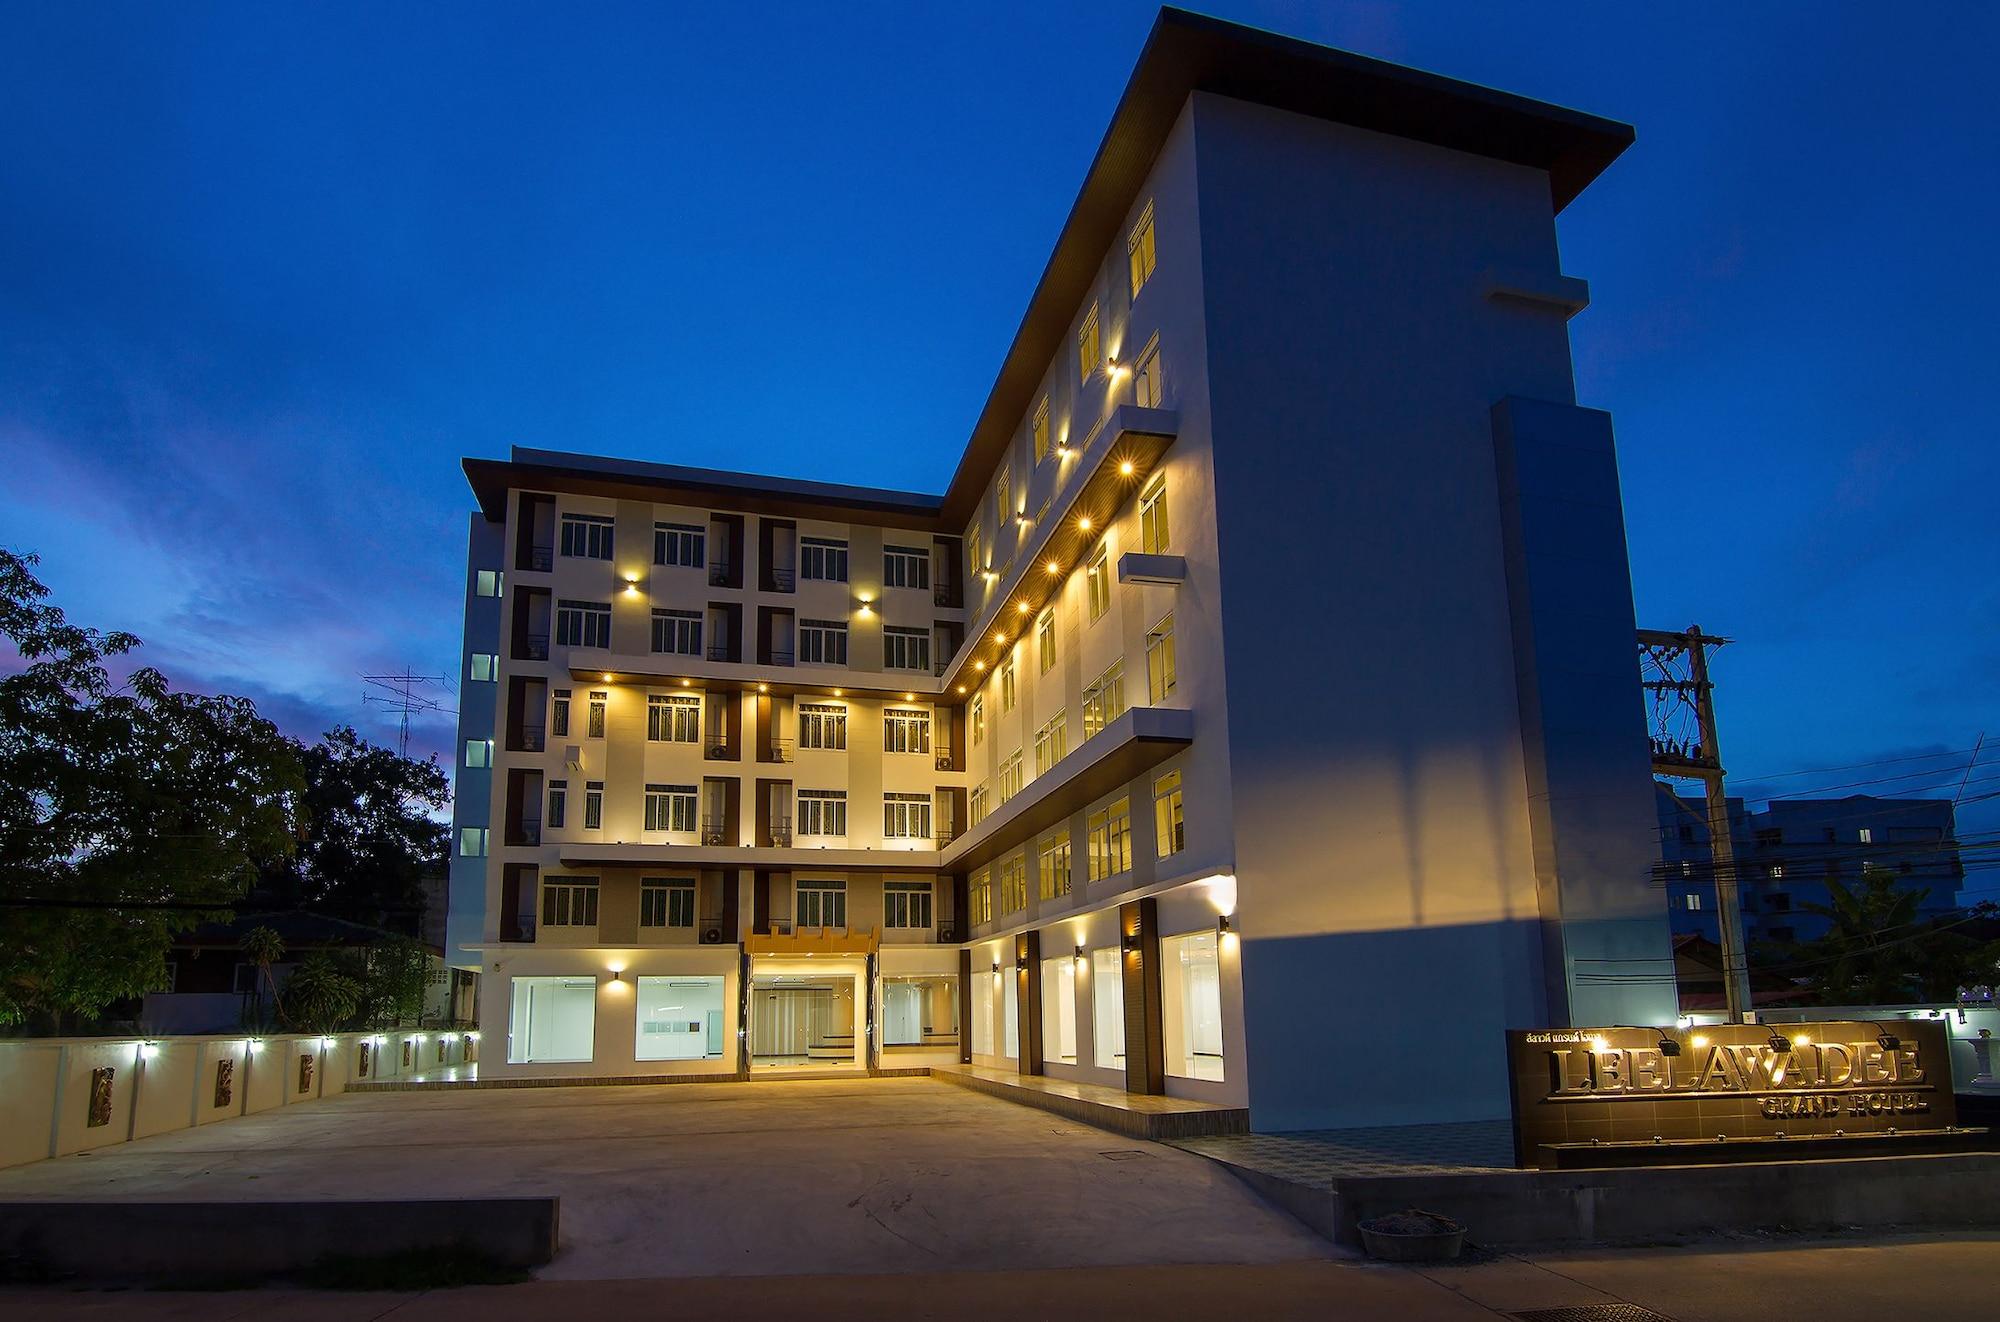 Leelawadee Grand Hotel, Muang Udon Thani